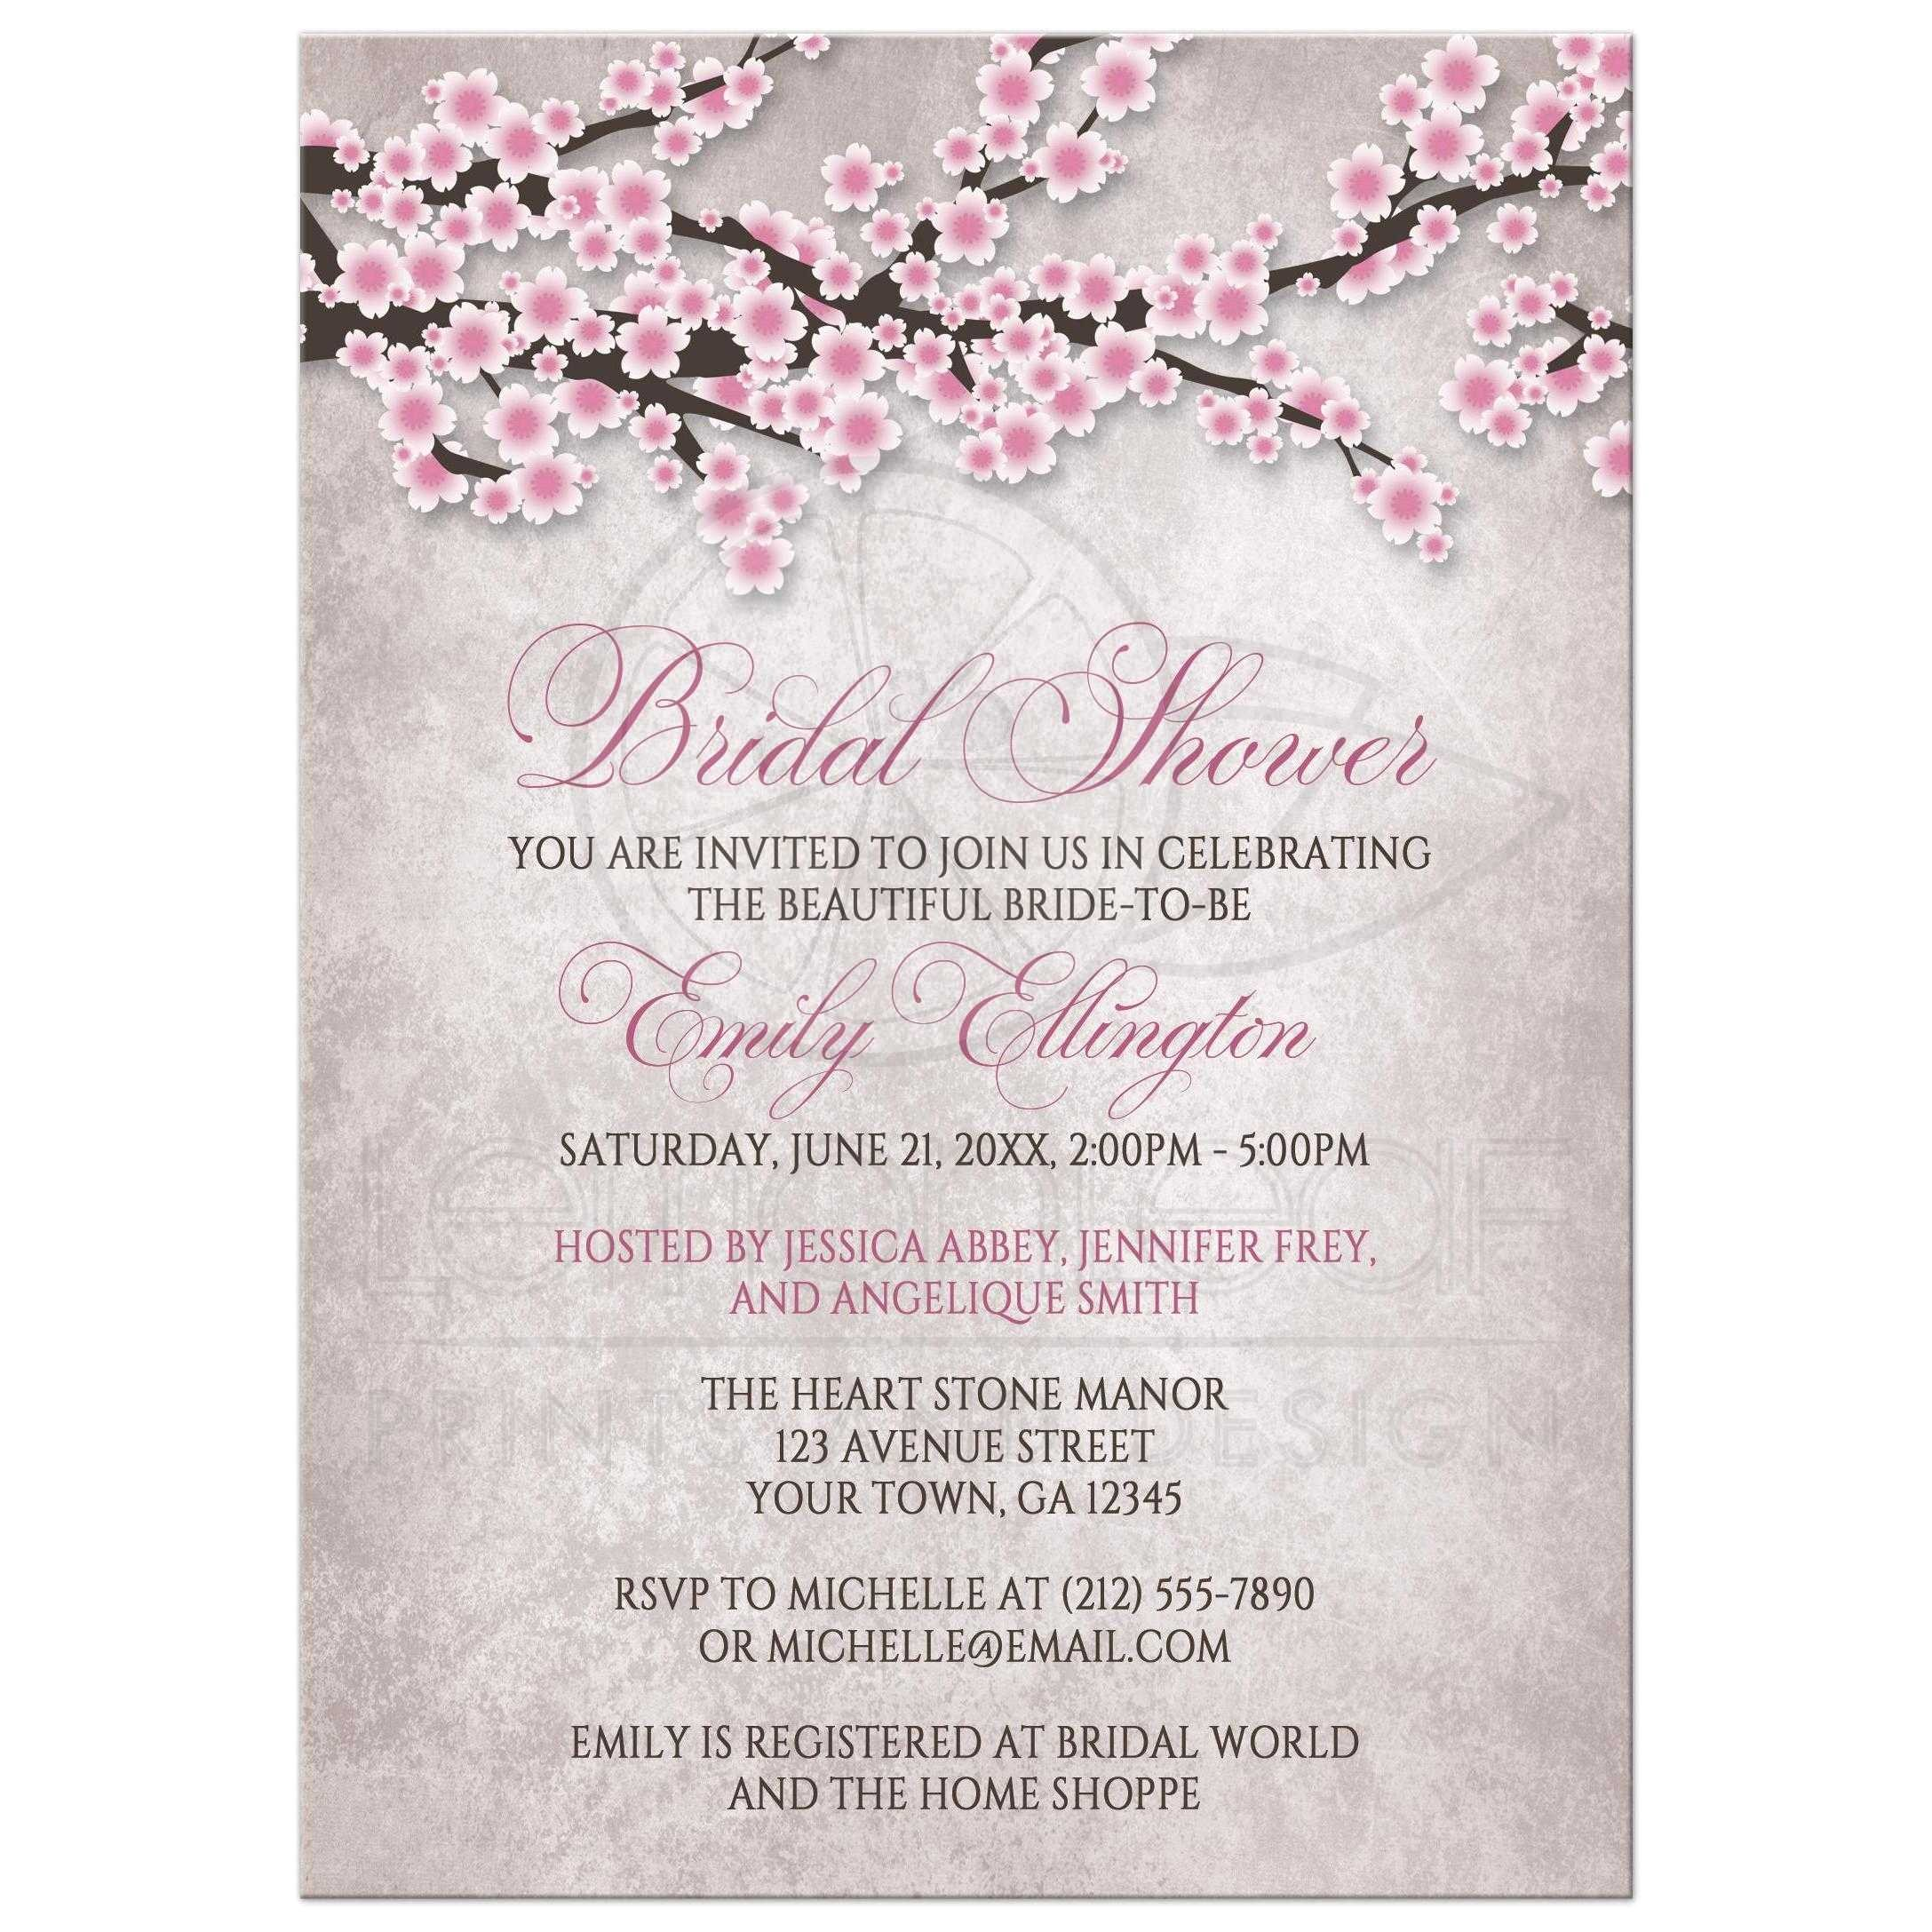 Cherry Blossom Bridal Shower Invitations Bridal Shower Invitations Rustic Pink Cherry Blossom